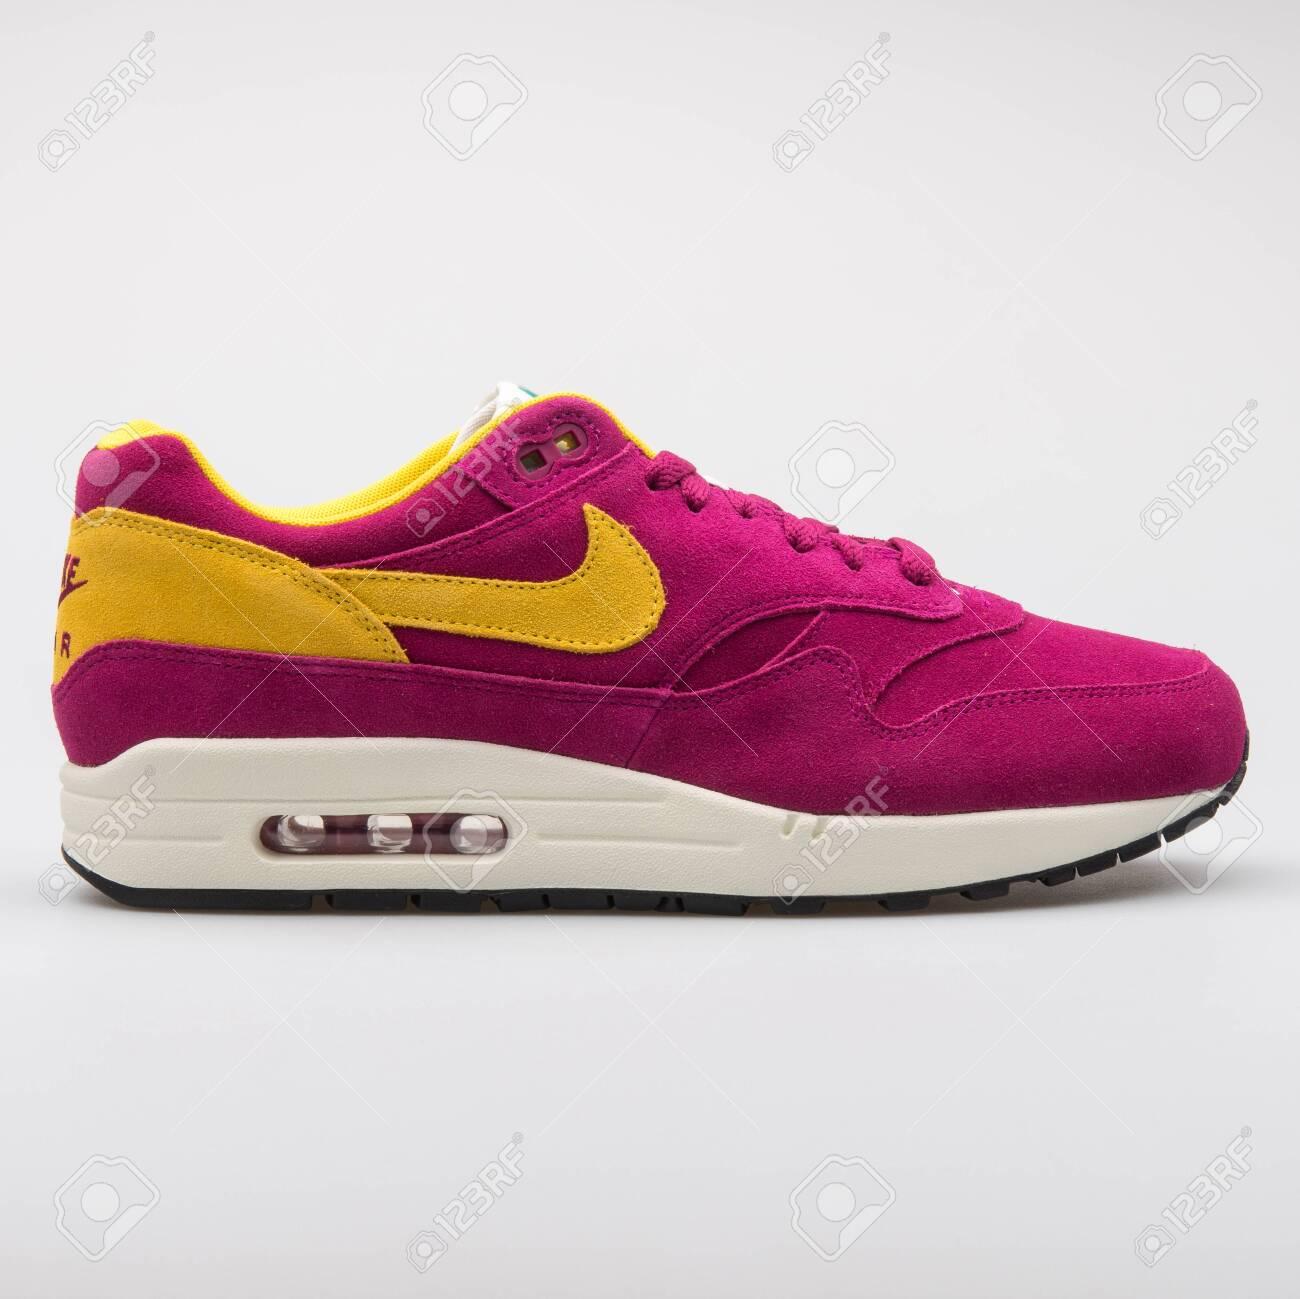 Nike Air Max 1 Premium Purple.. Stock